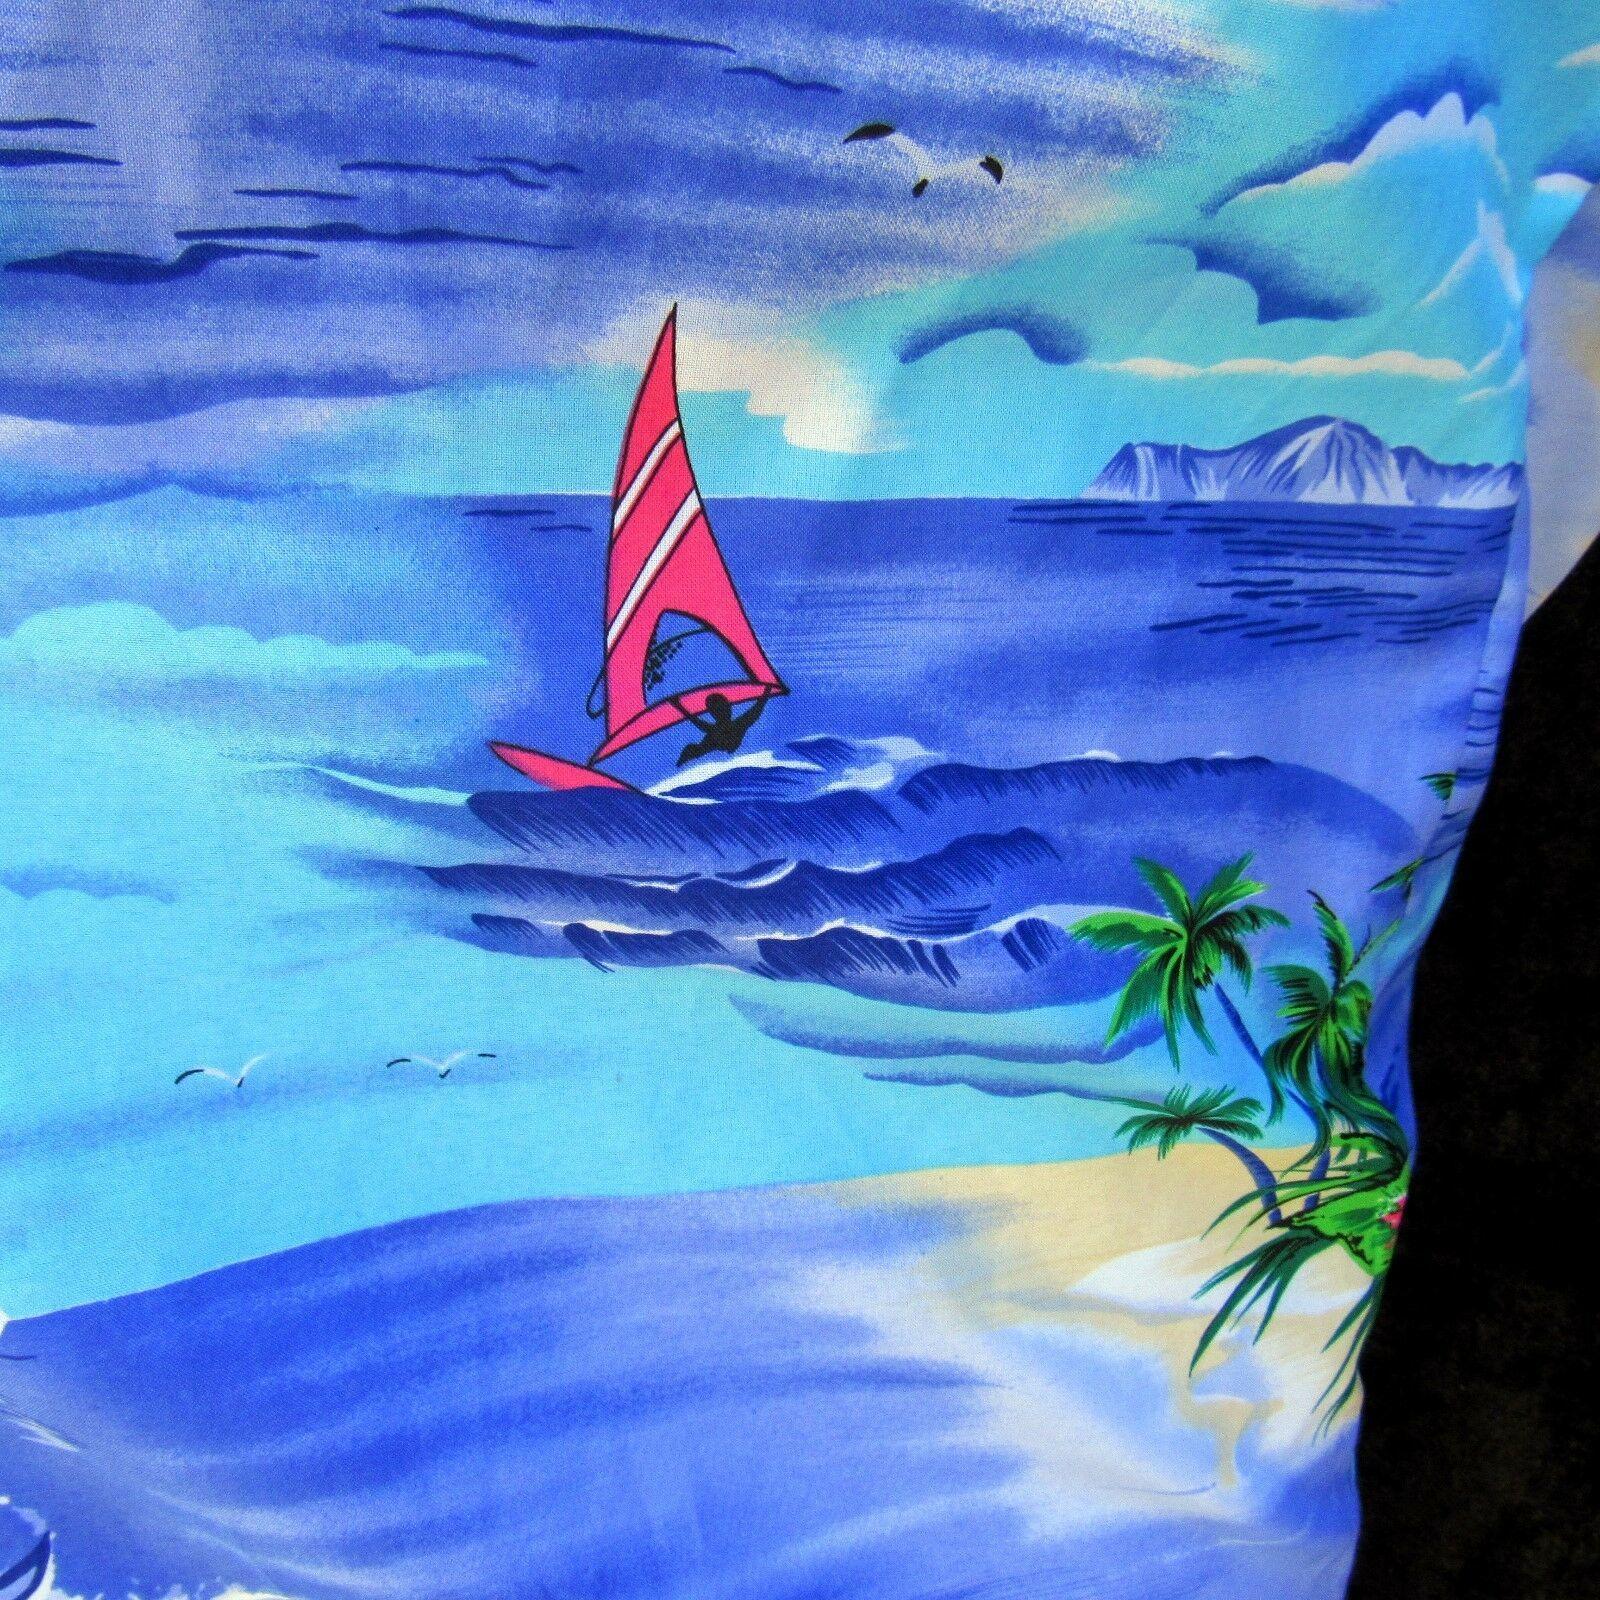 Vtg Royal Creations Aloha Shirt Size Large Diamond Head Outrigger Welt Pocket